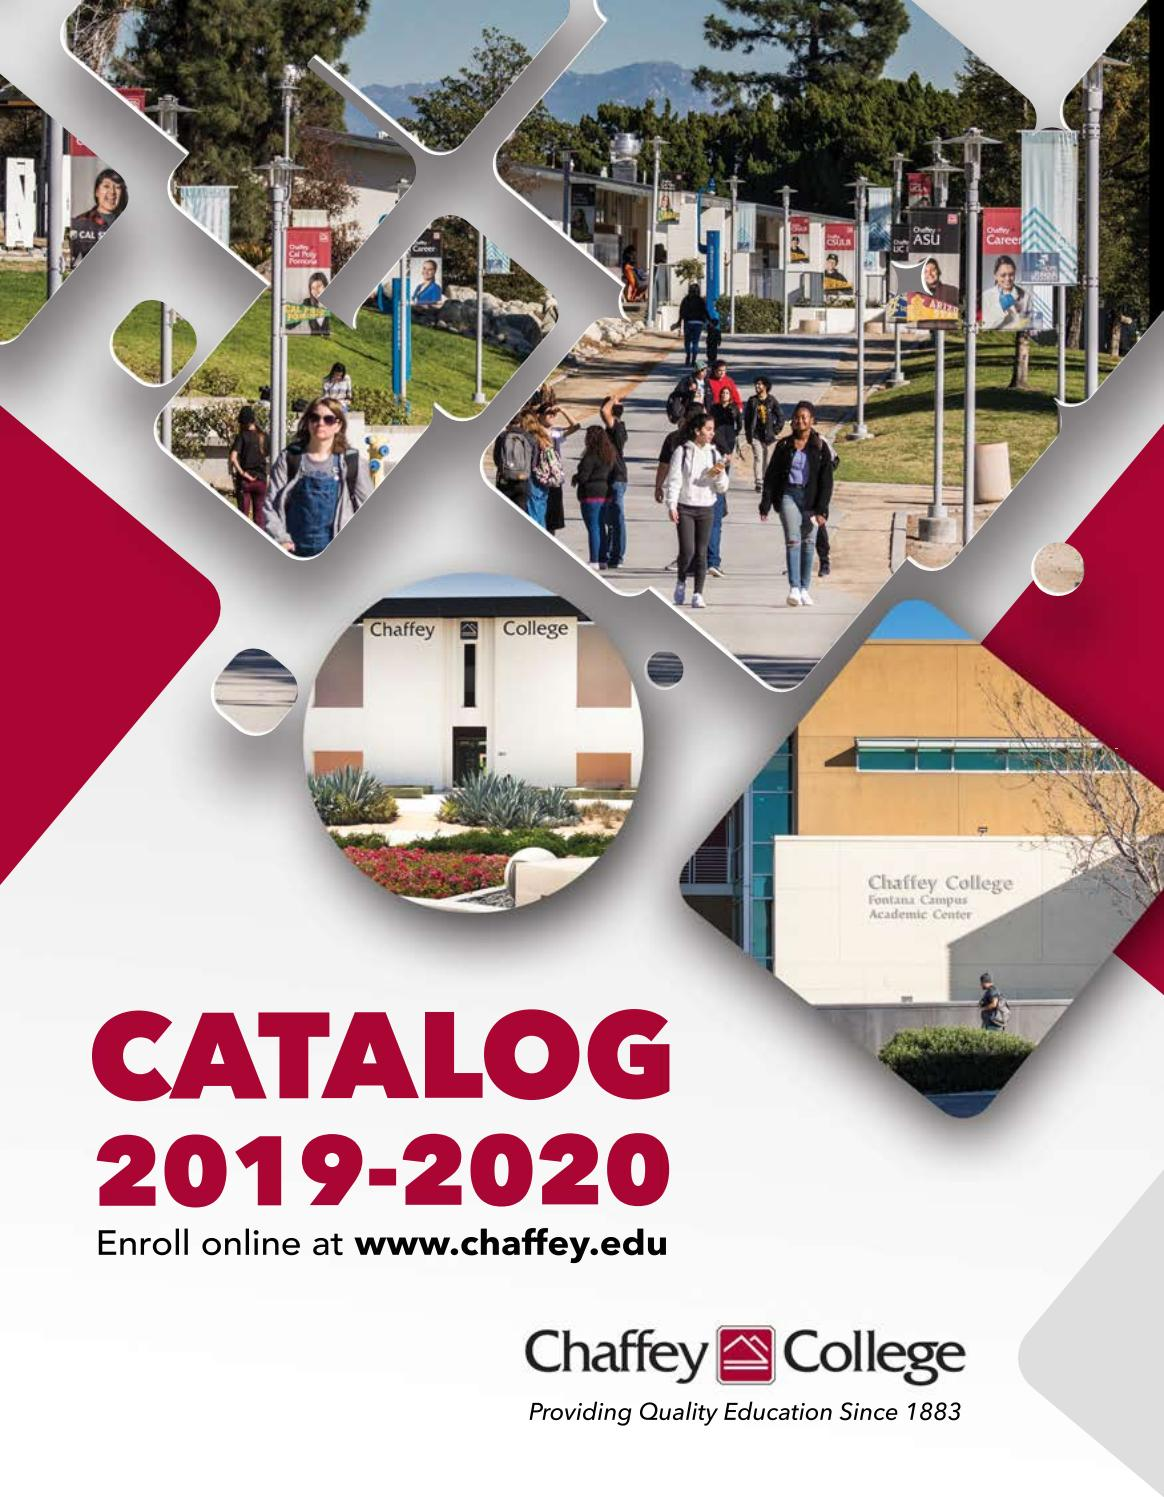 hight resolution of Chaffey College Catalog 2019 - 2020 by Chaffey College - issuu